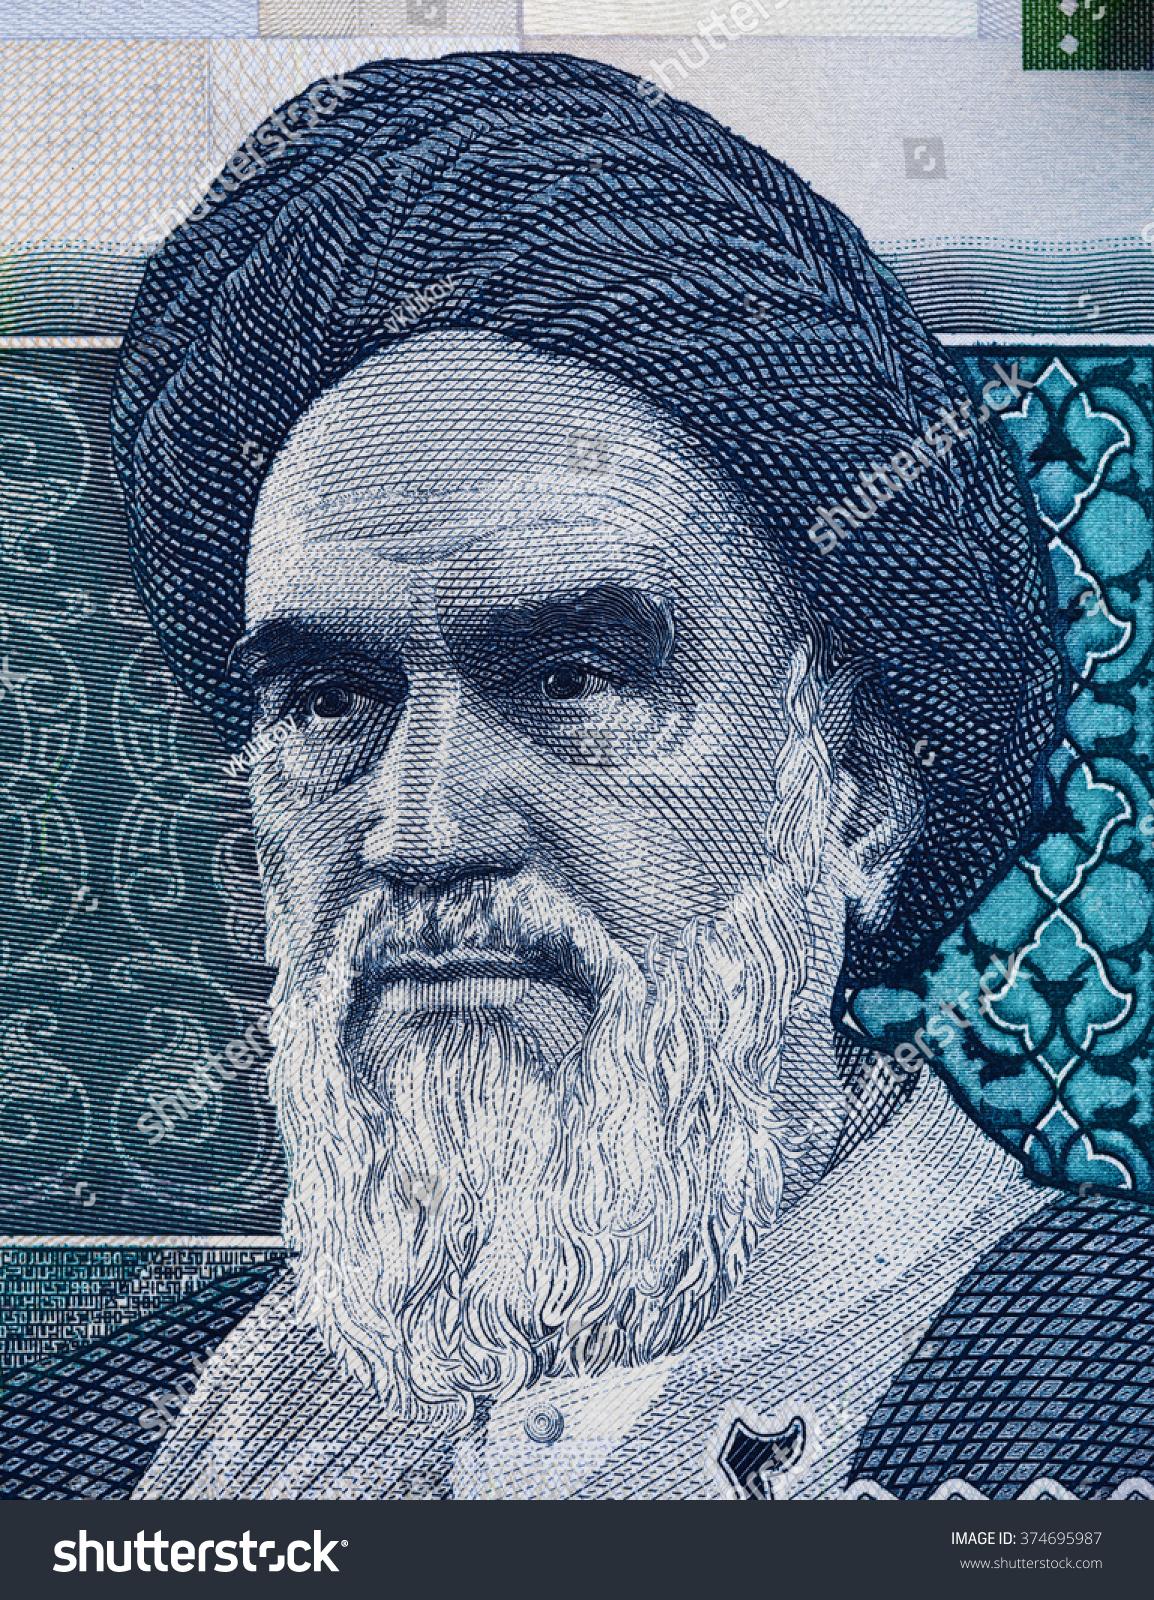 Ayatollah ruhollah khomeini portrait on iranian 20000 rial banknote macro iran money closeup